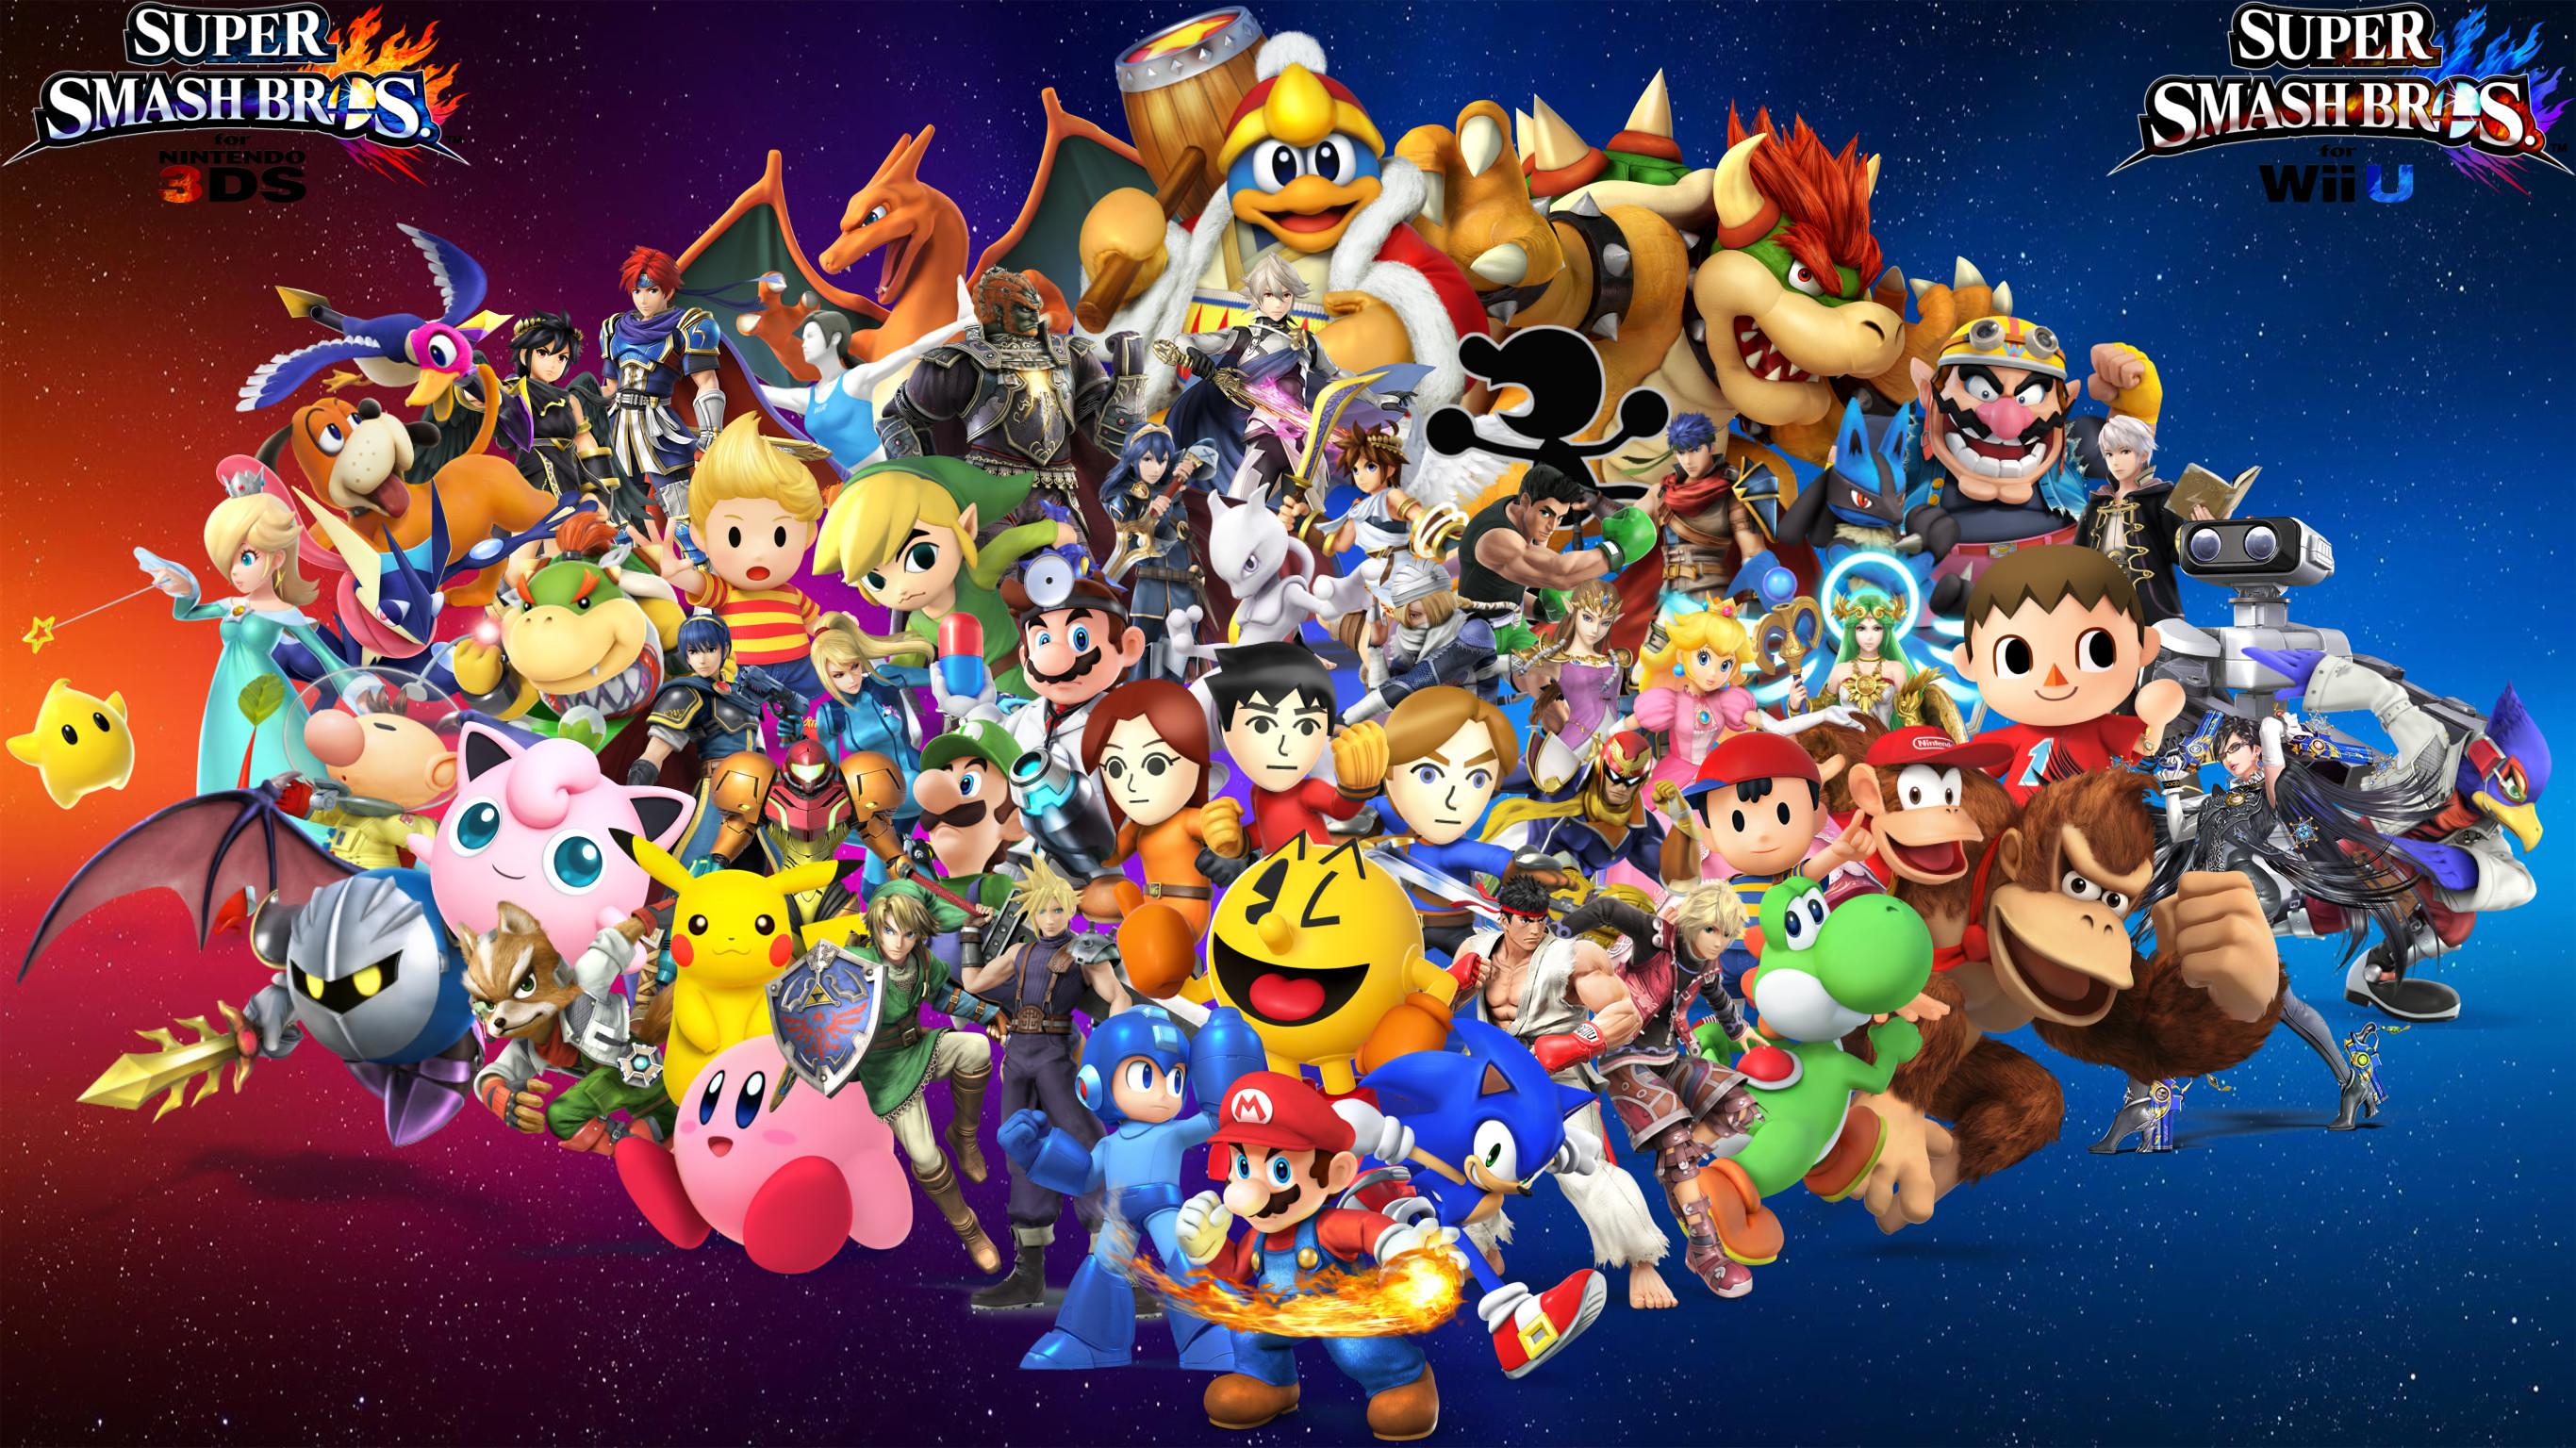 Smash Bros 4 Wallpaper (80+ images)